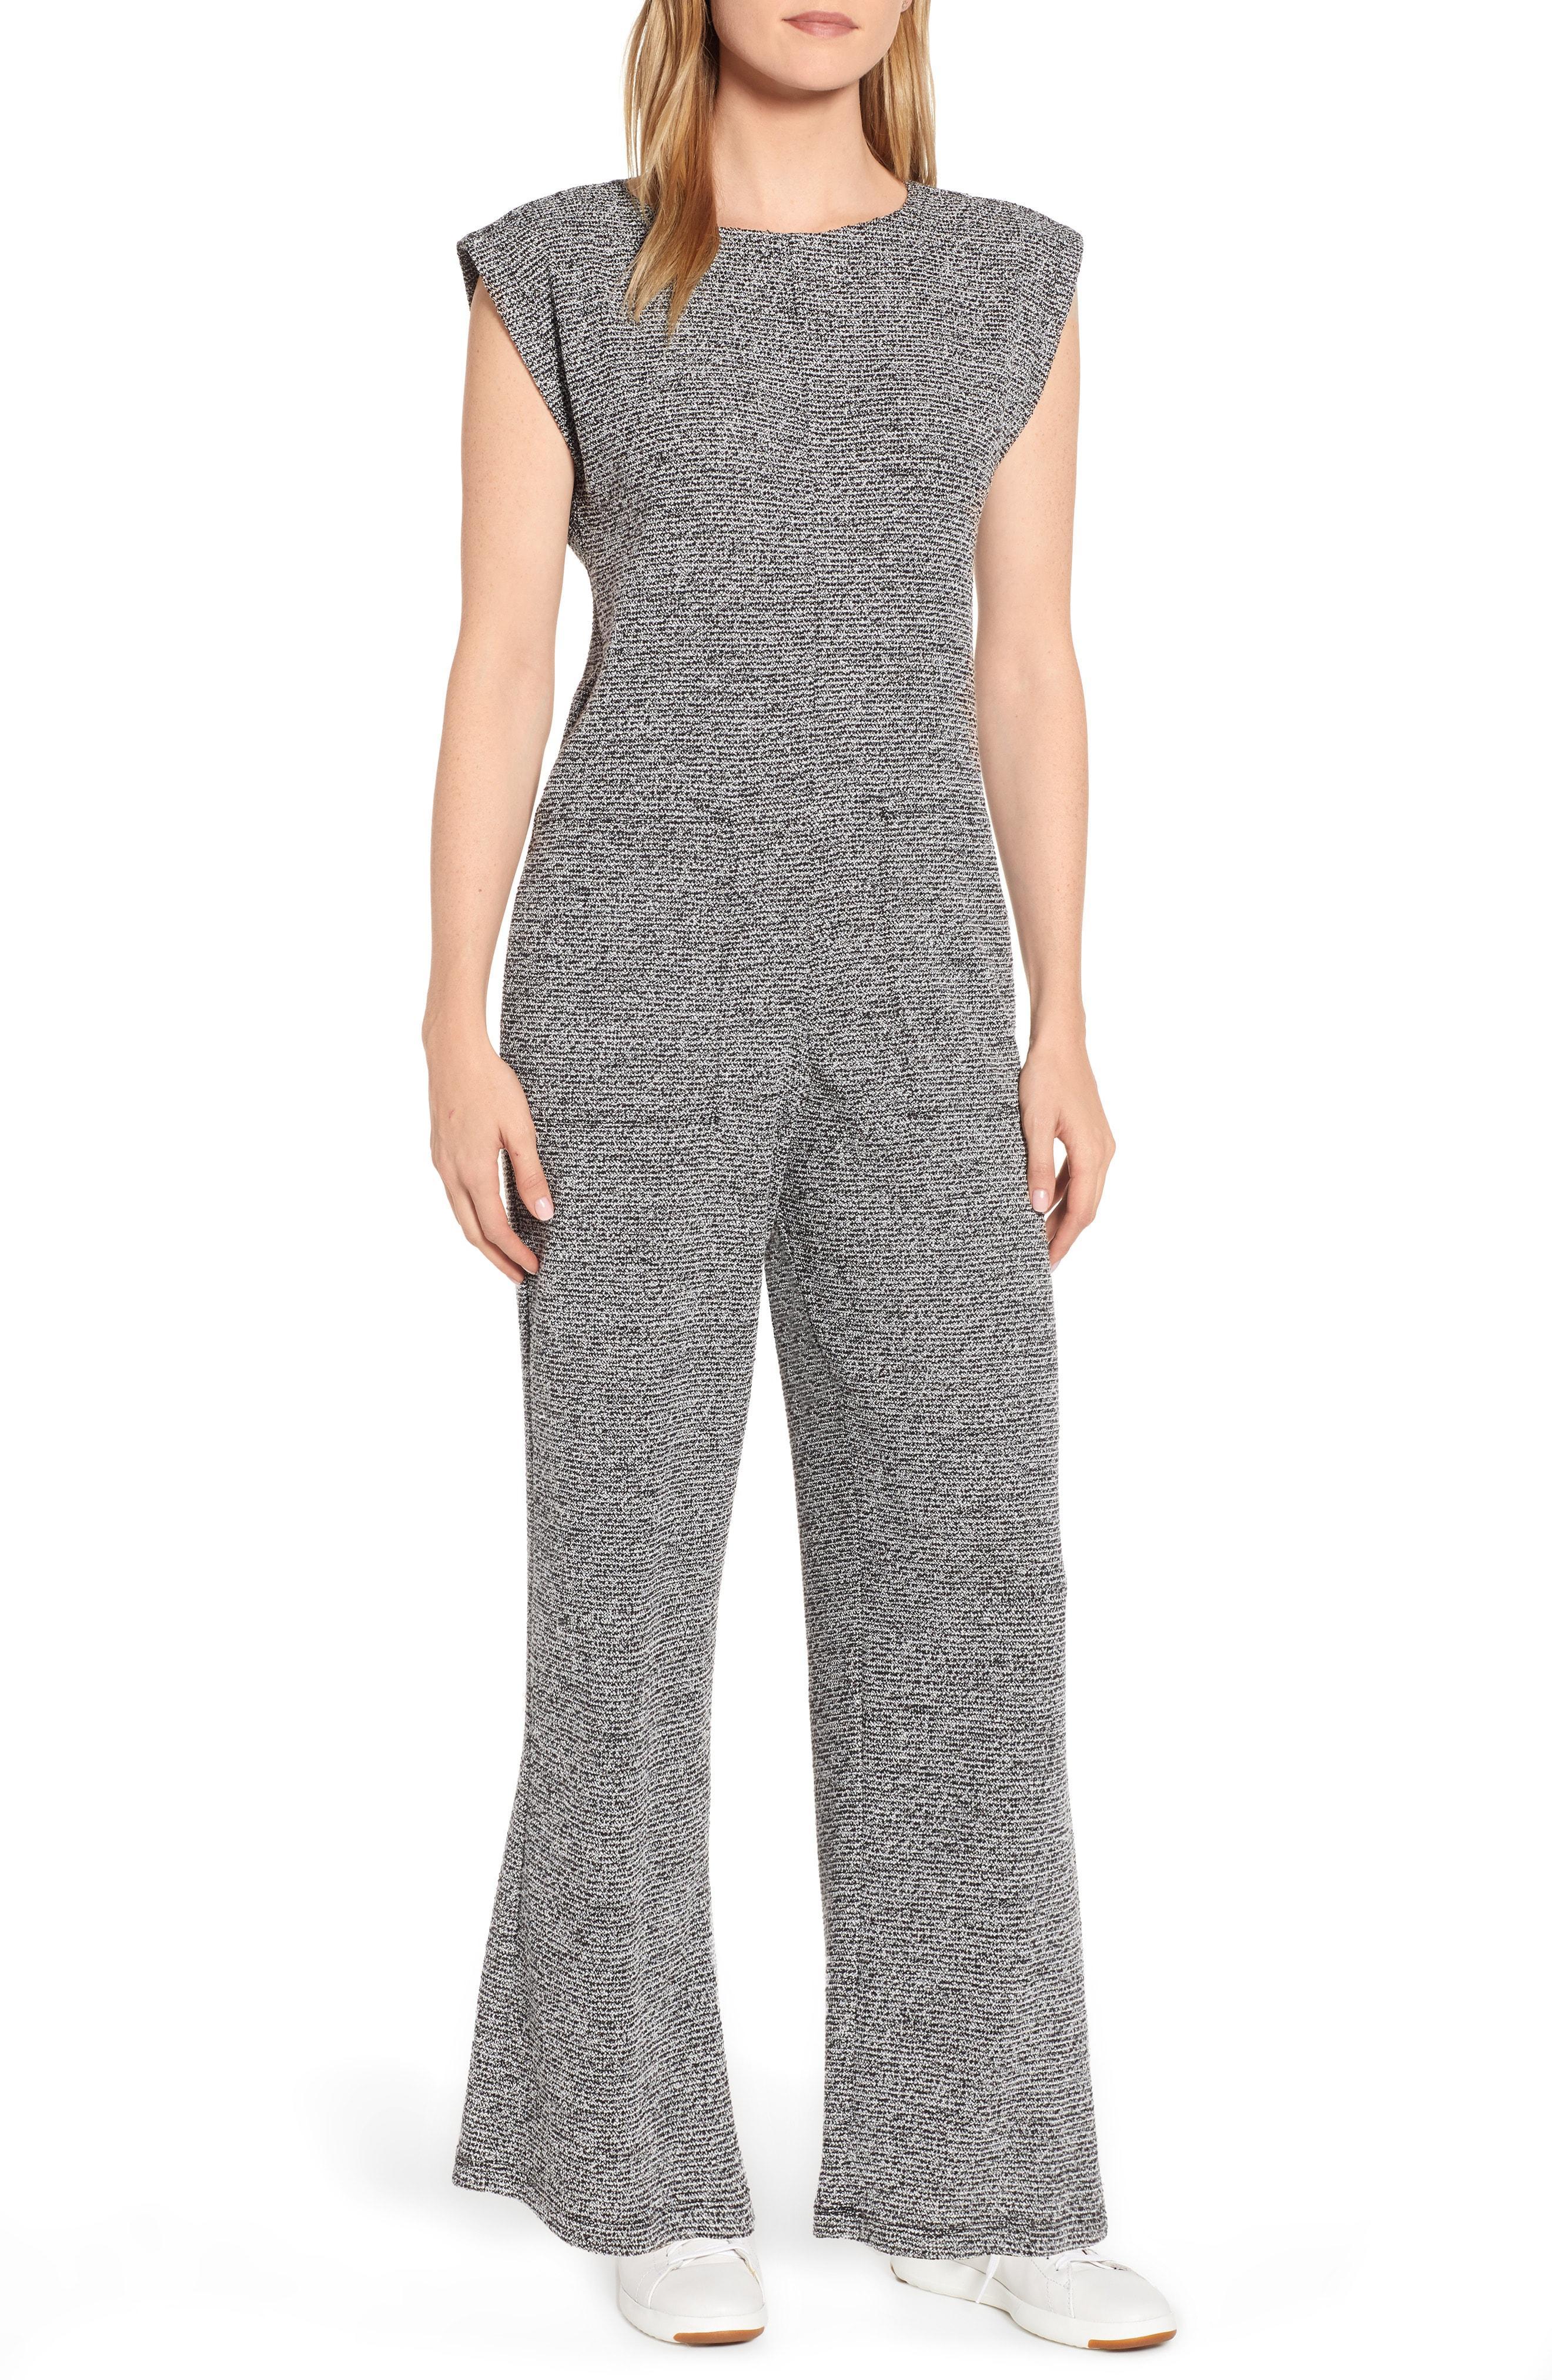 257a69d3e80c Lyst - Lou   Grey Loyola Boucle Knit Jumpsuit in Black